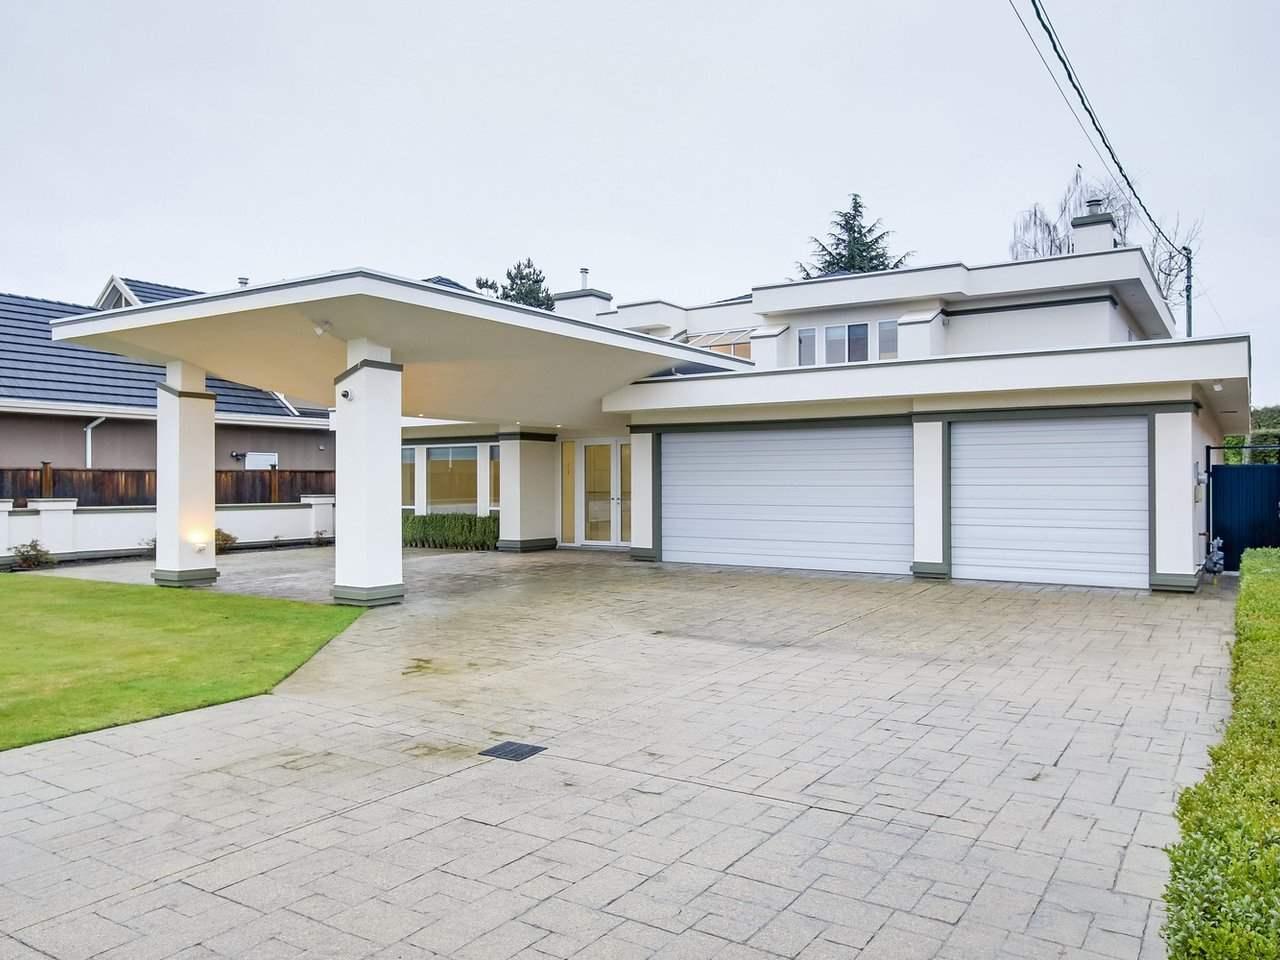 Sold: 6840 Donald Road, Richmond, BC